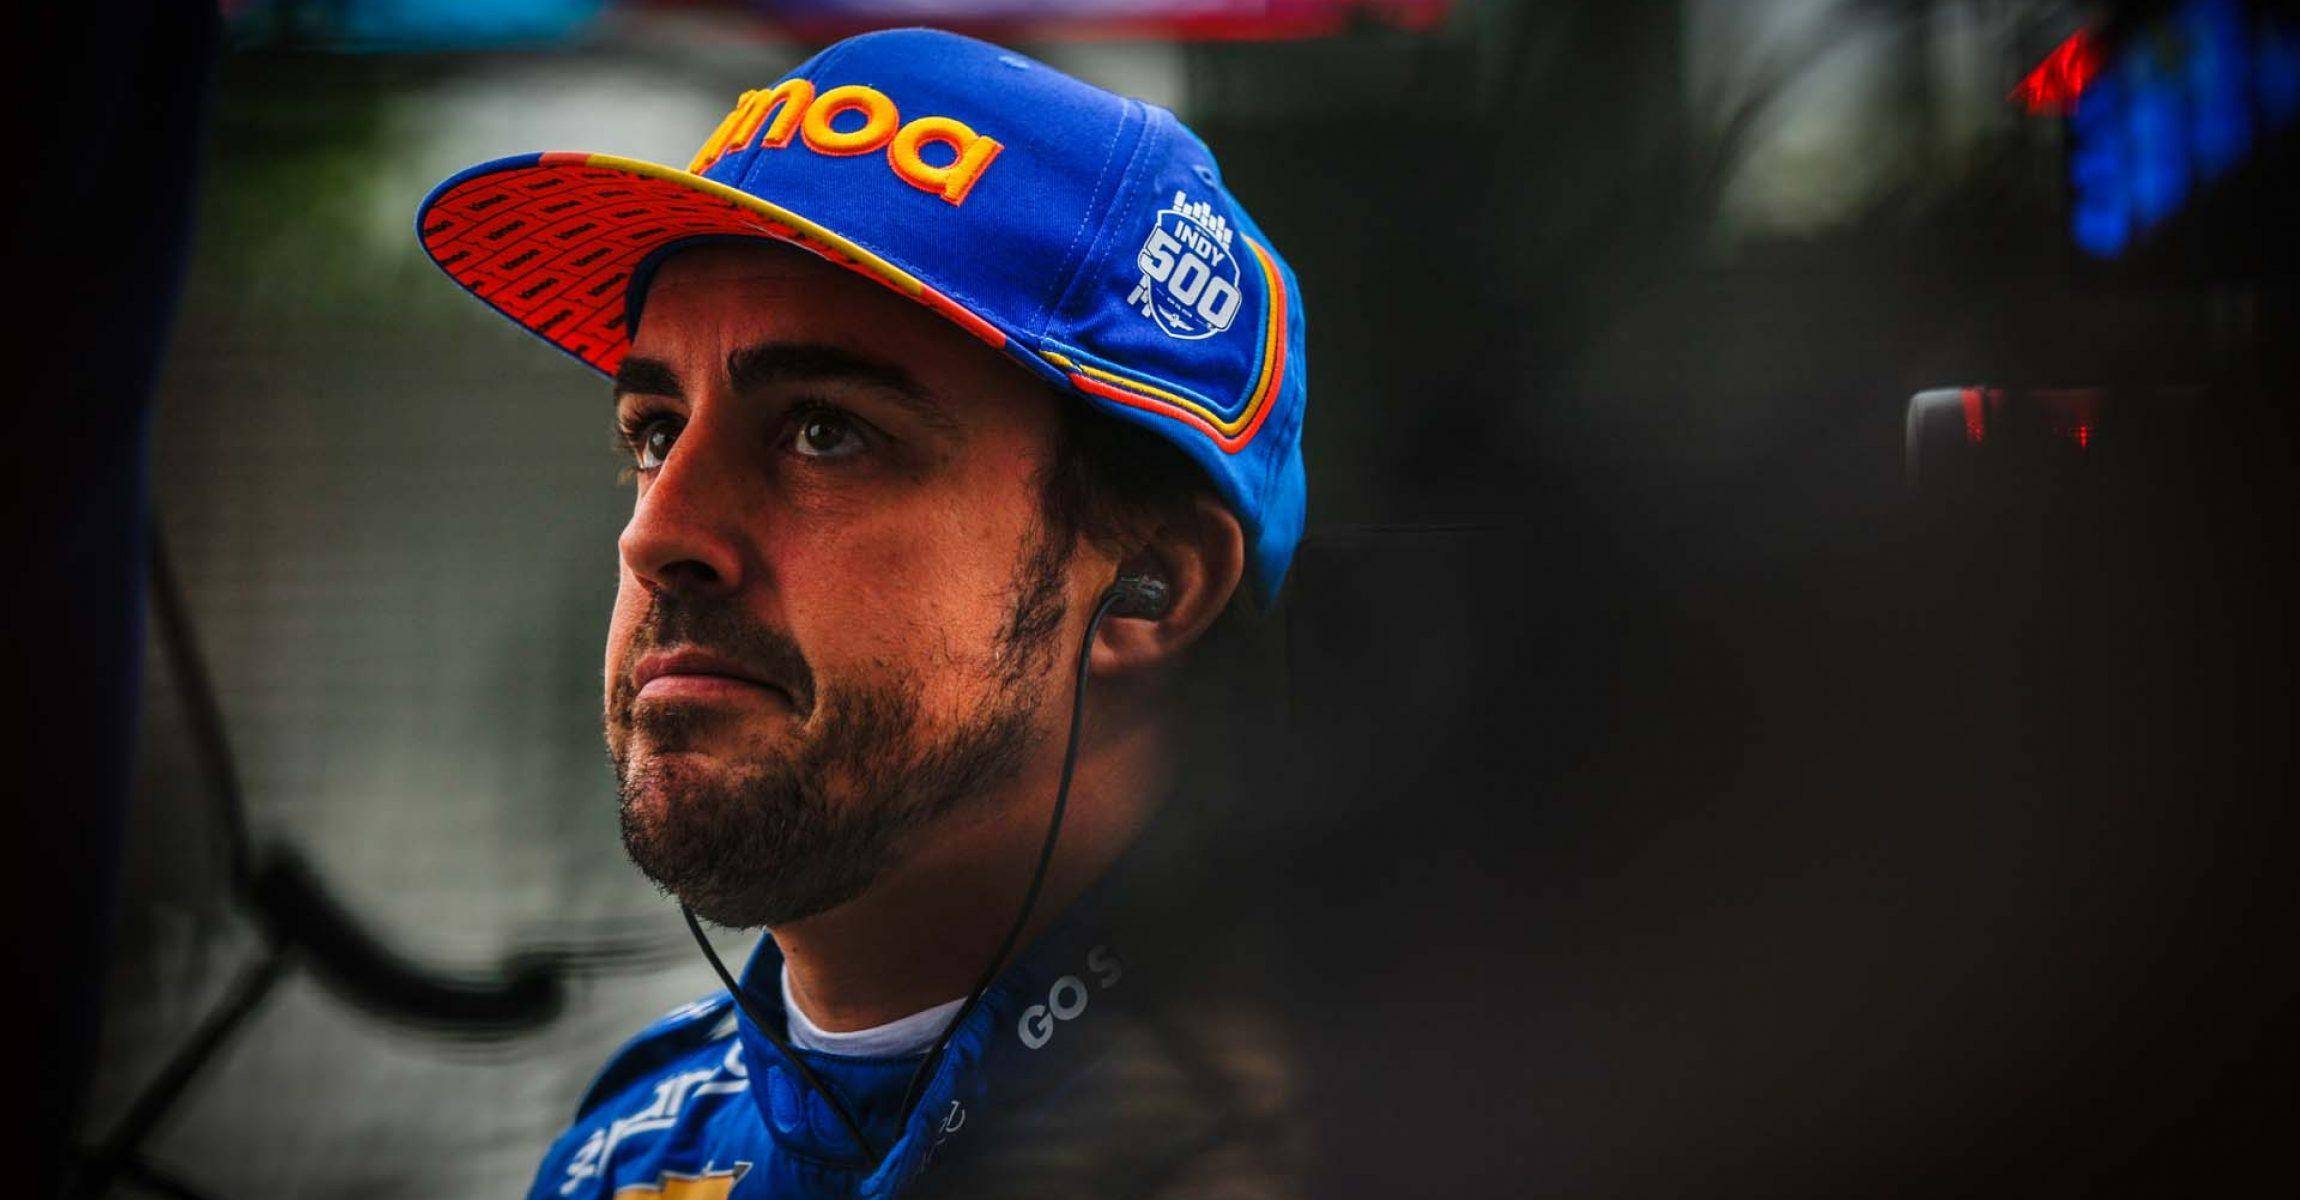 McLaren, Fernando Alonso, IndyCar, Indianapolis 500, 2019